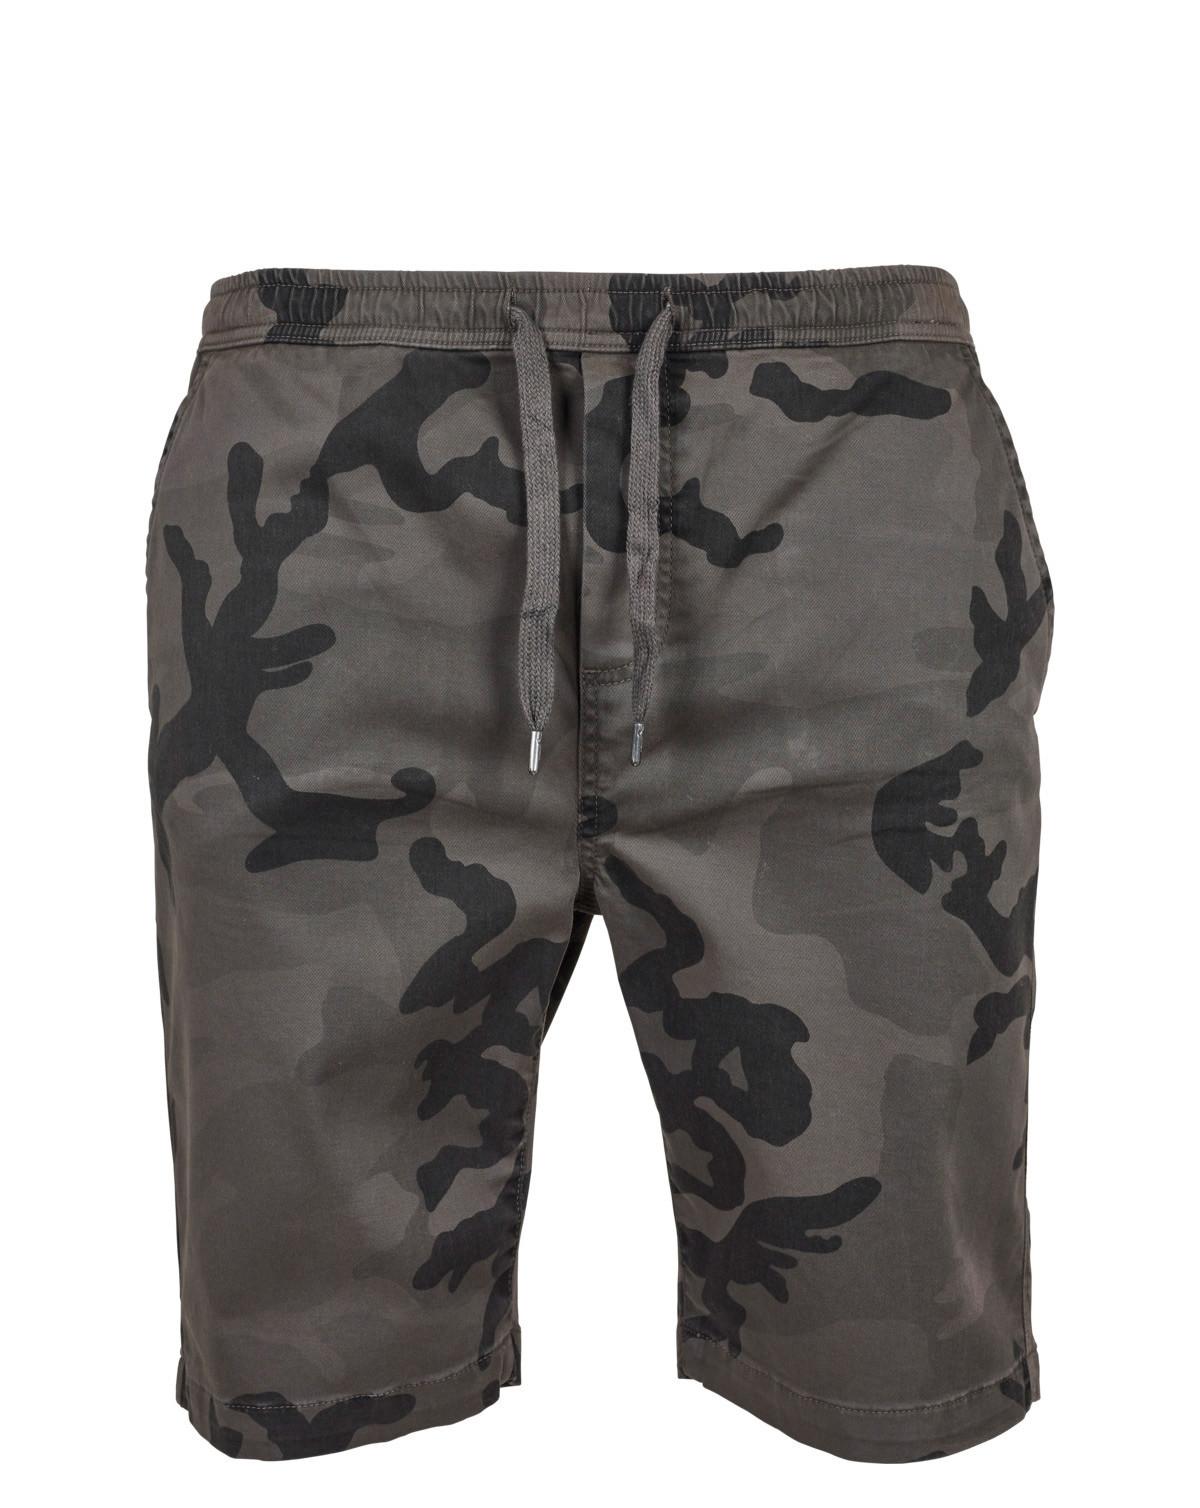 Urban Classics Kamouflage Joggingshorts (Dark Camo, S)